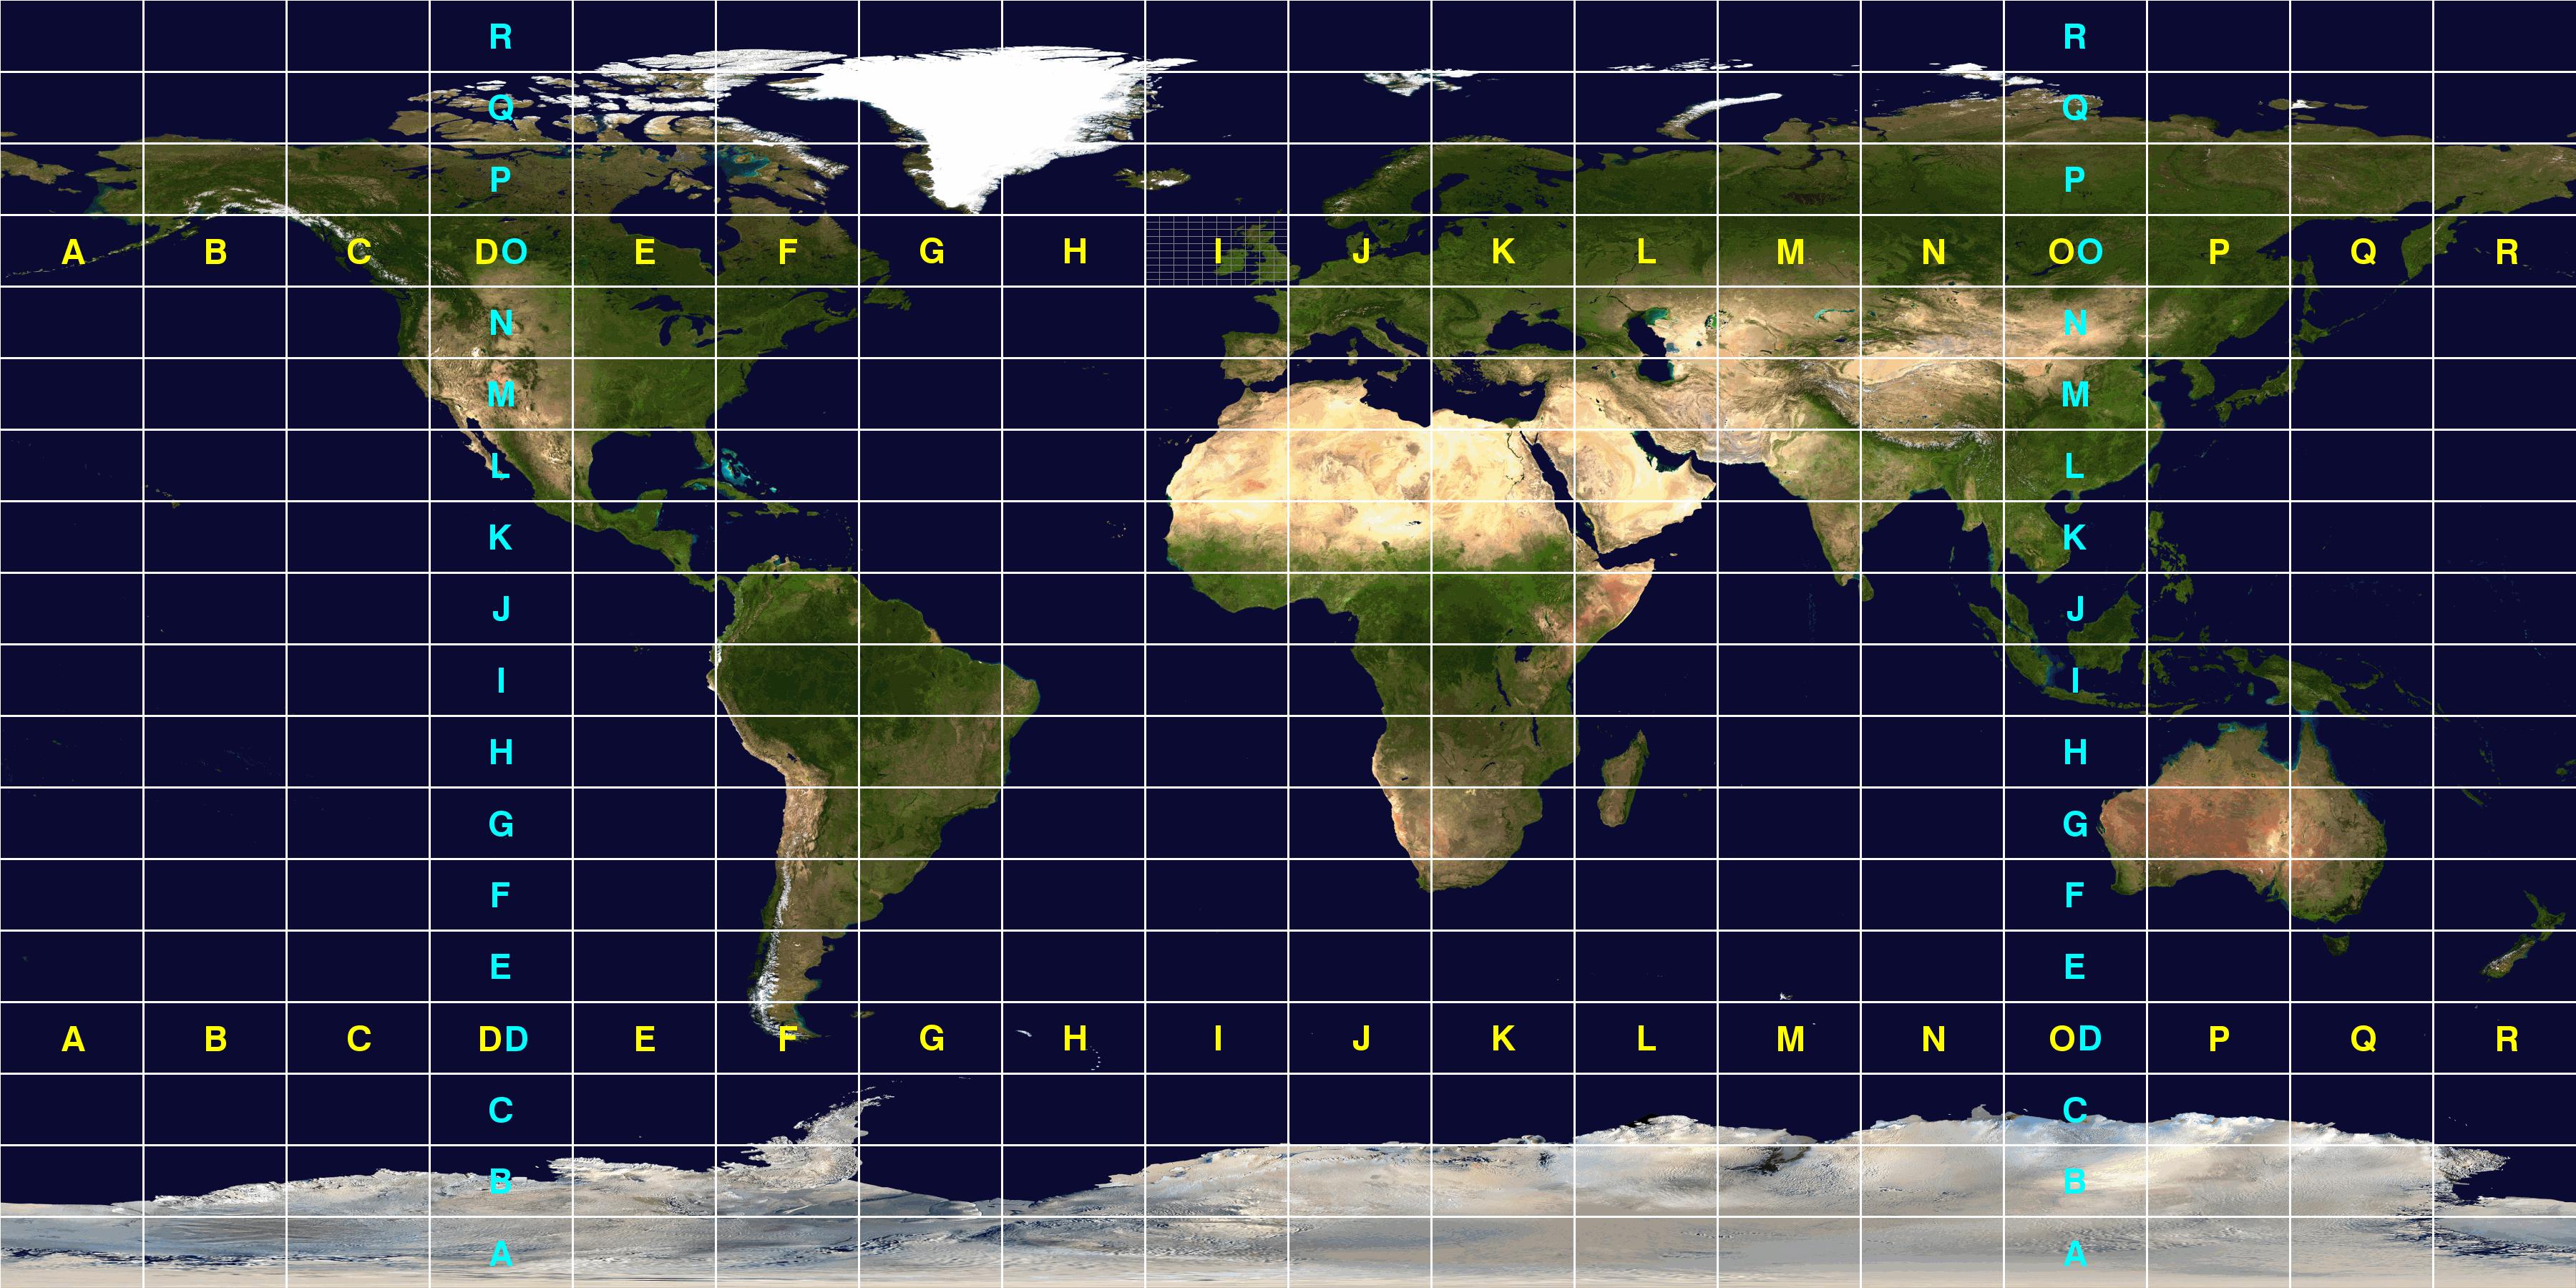 Maidenhead Locator System Wikiwand - Us maidenhead grid square map